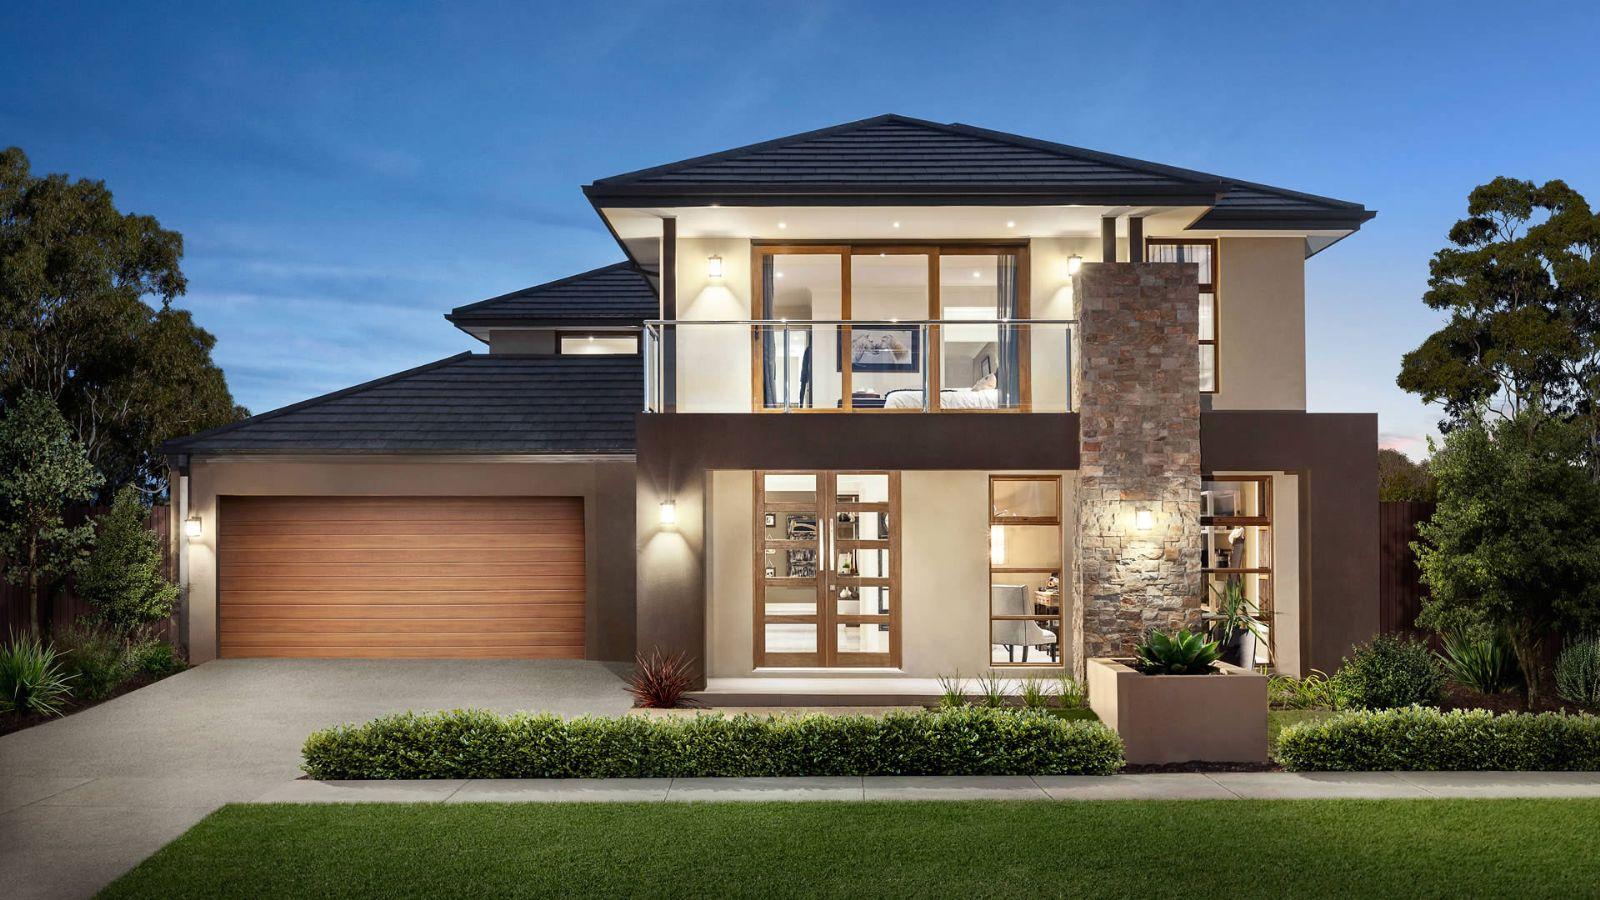 Good Home Design Ideas: MẪU NHÀ ĐẸP